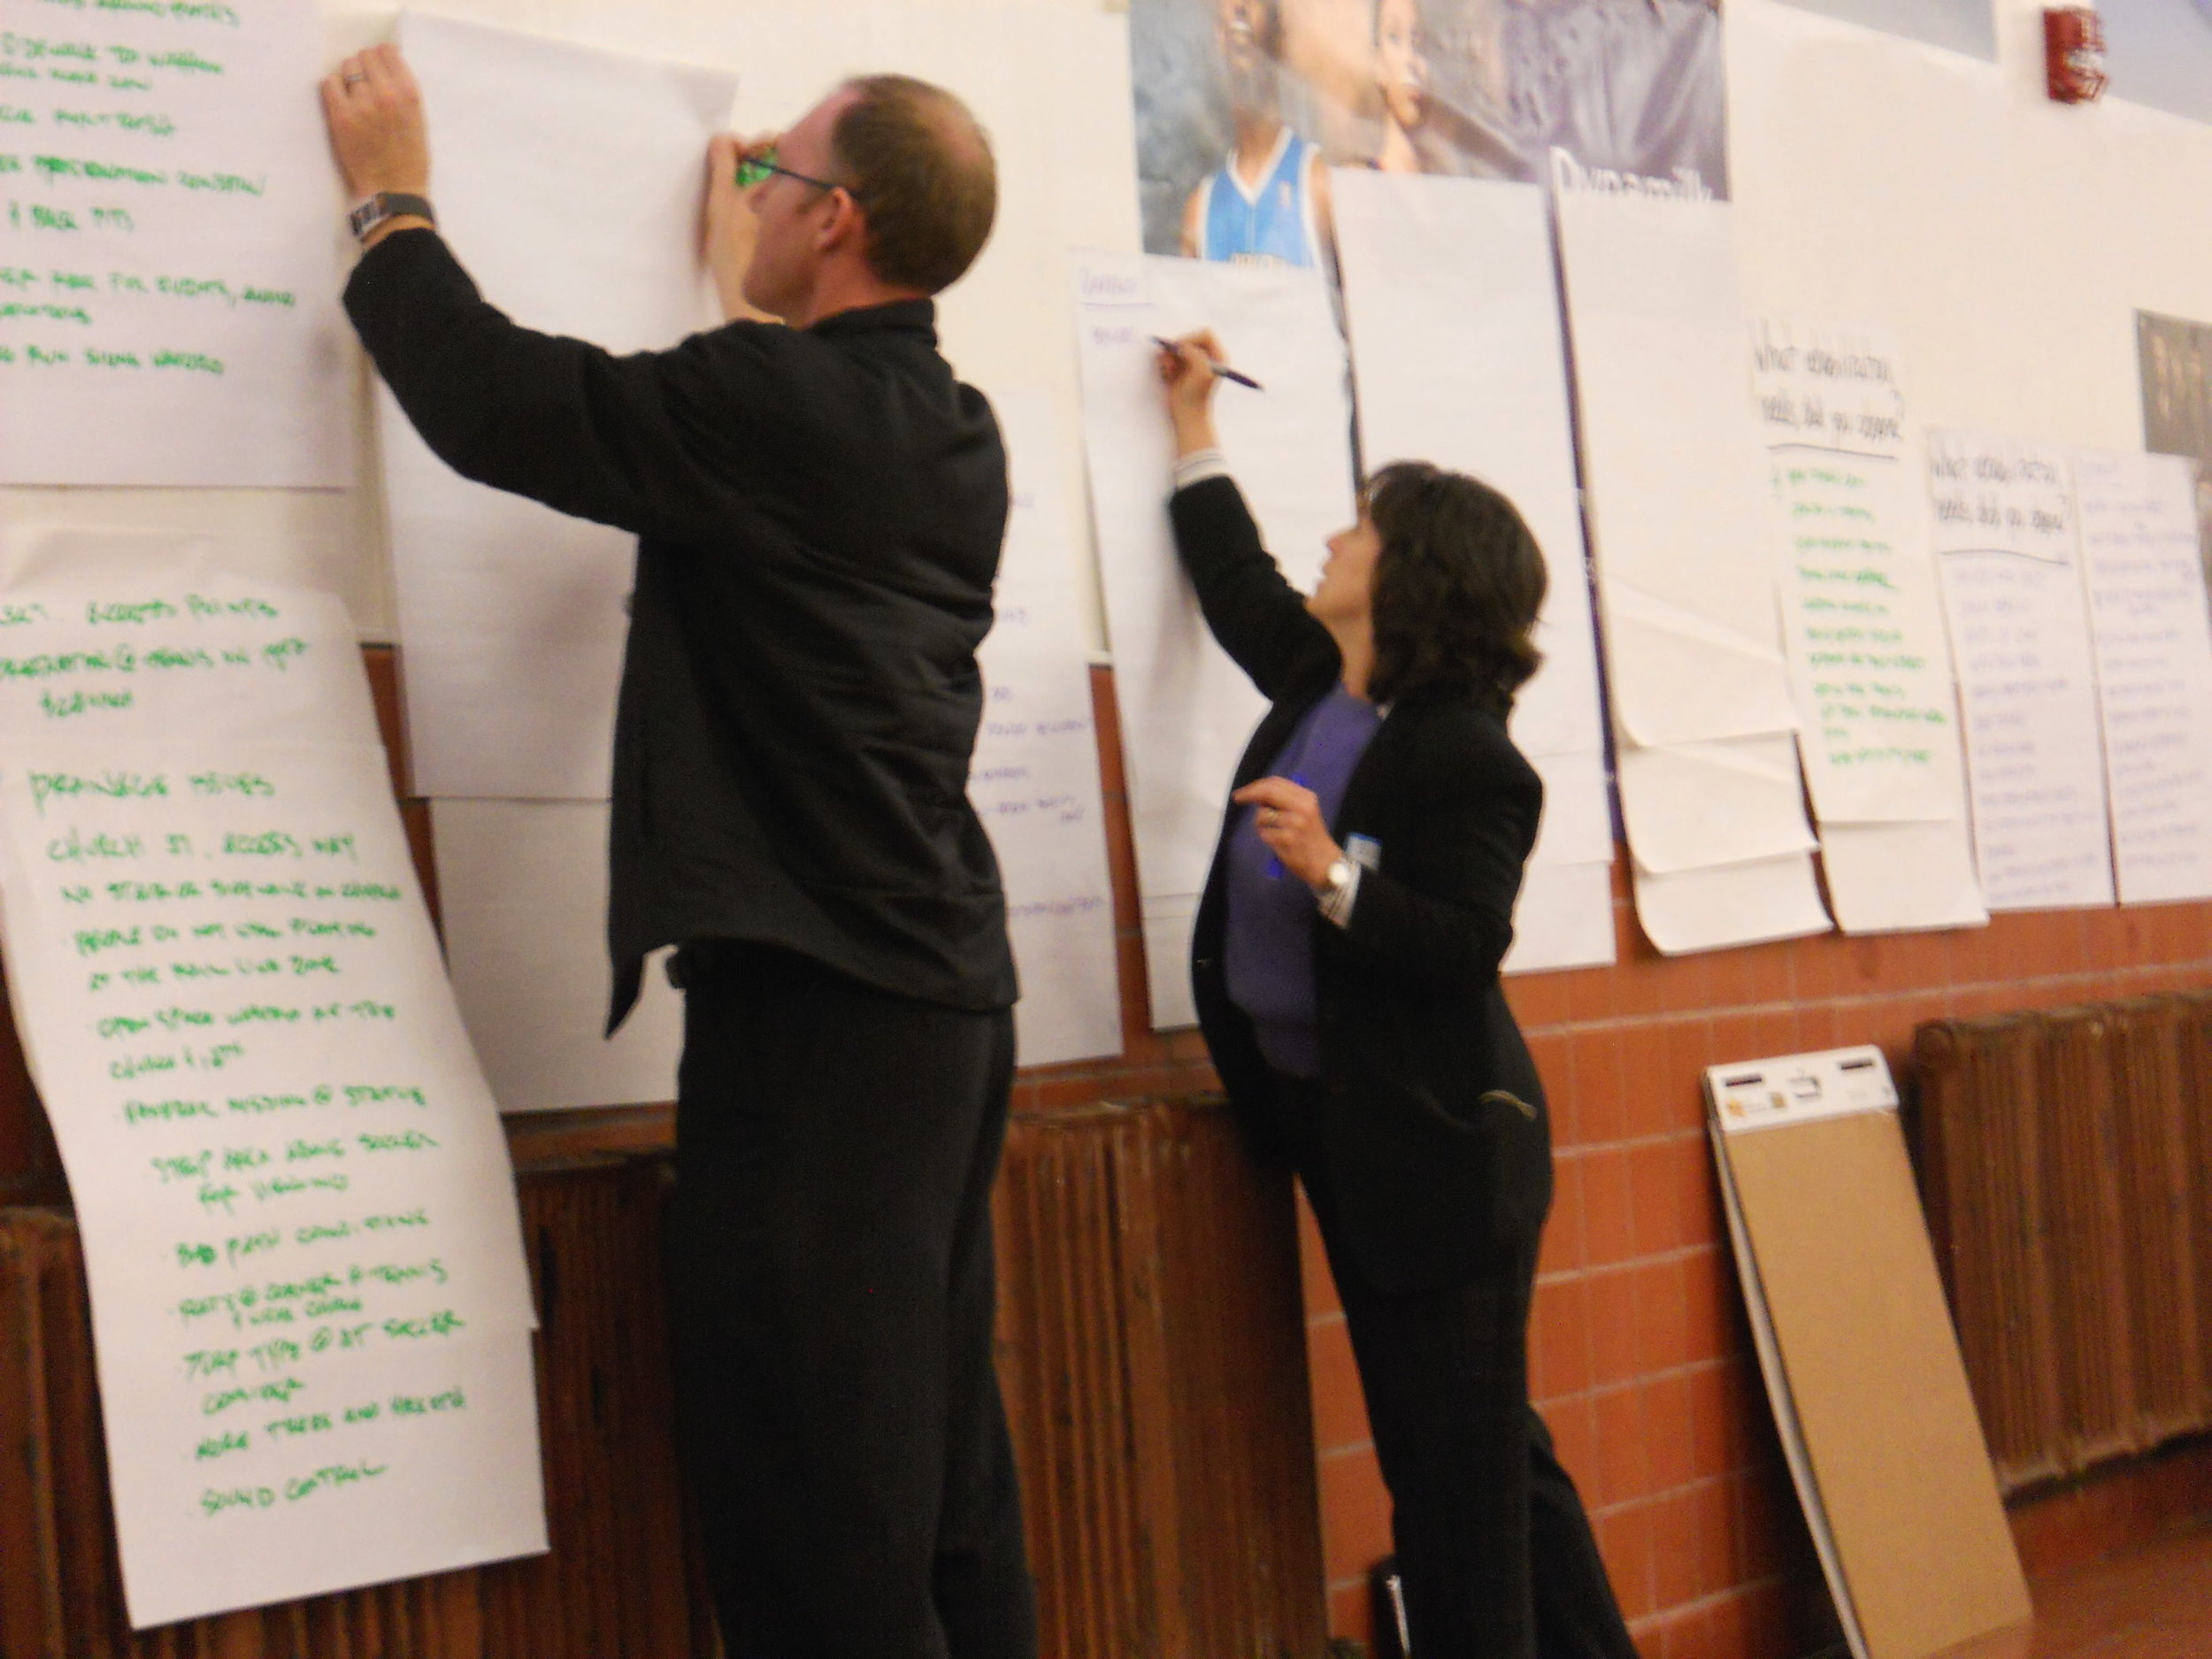 Recording stakeholder input